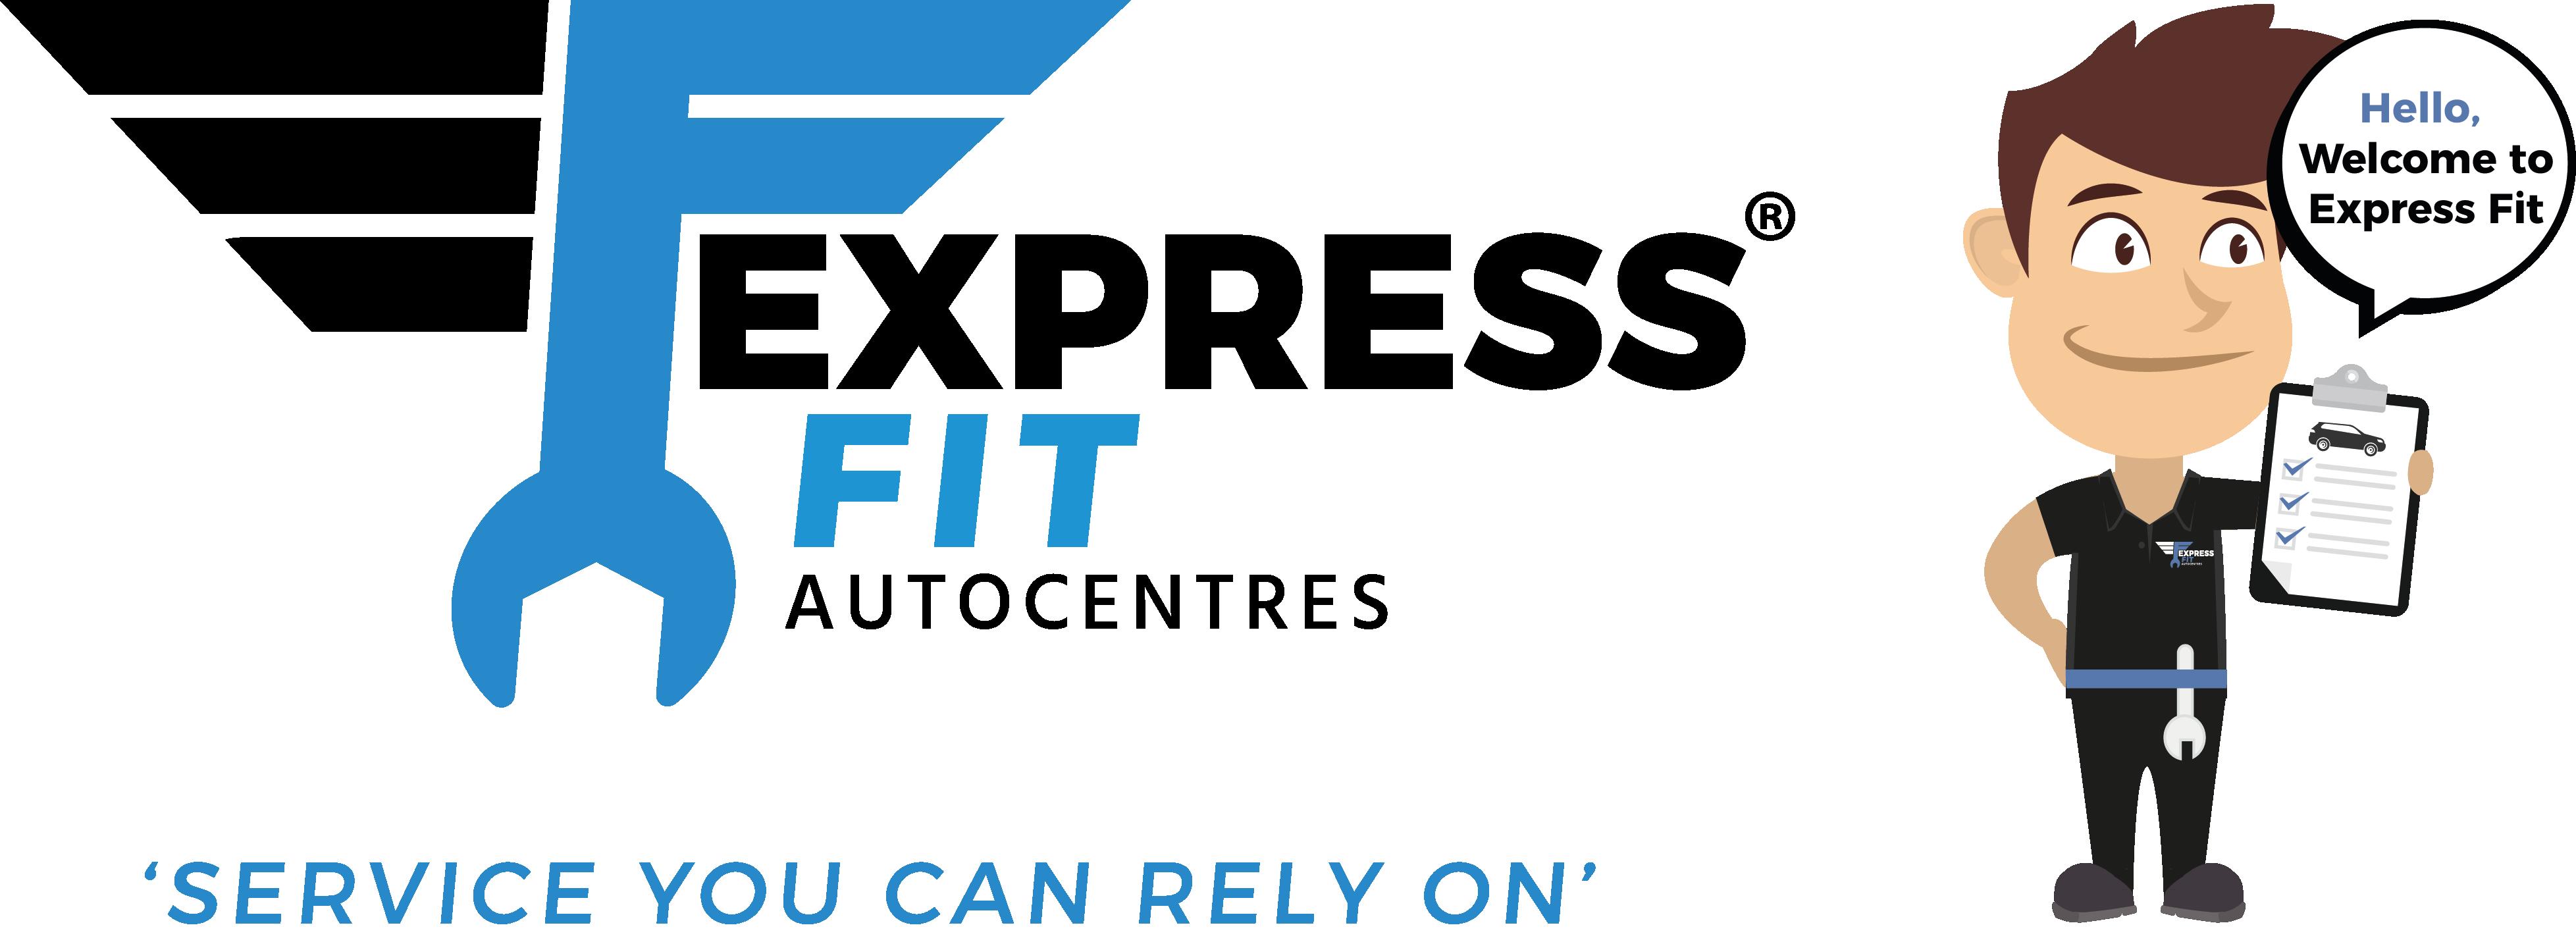 Read Express Fit Autocentres Reviews